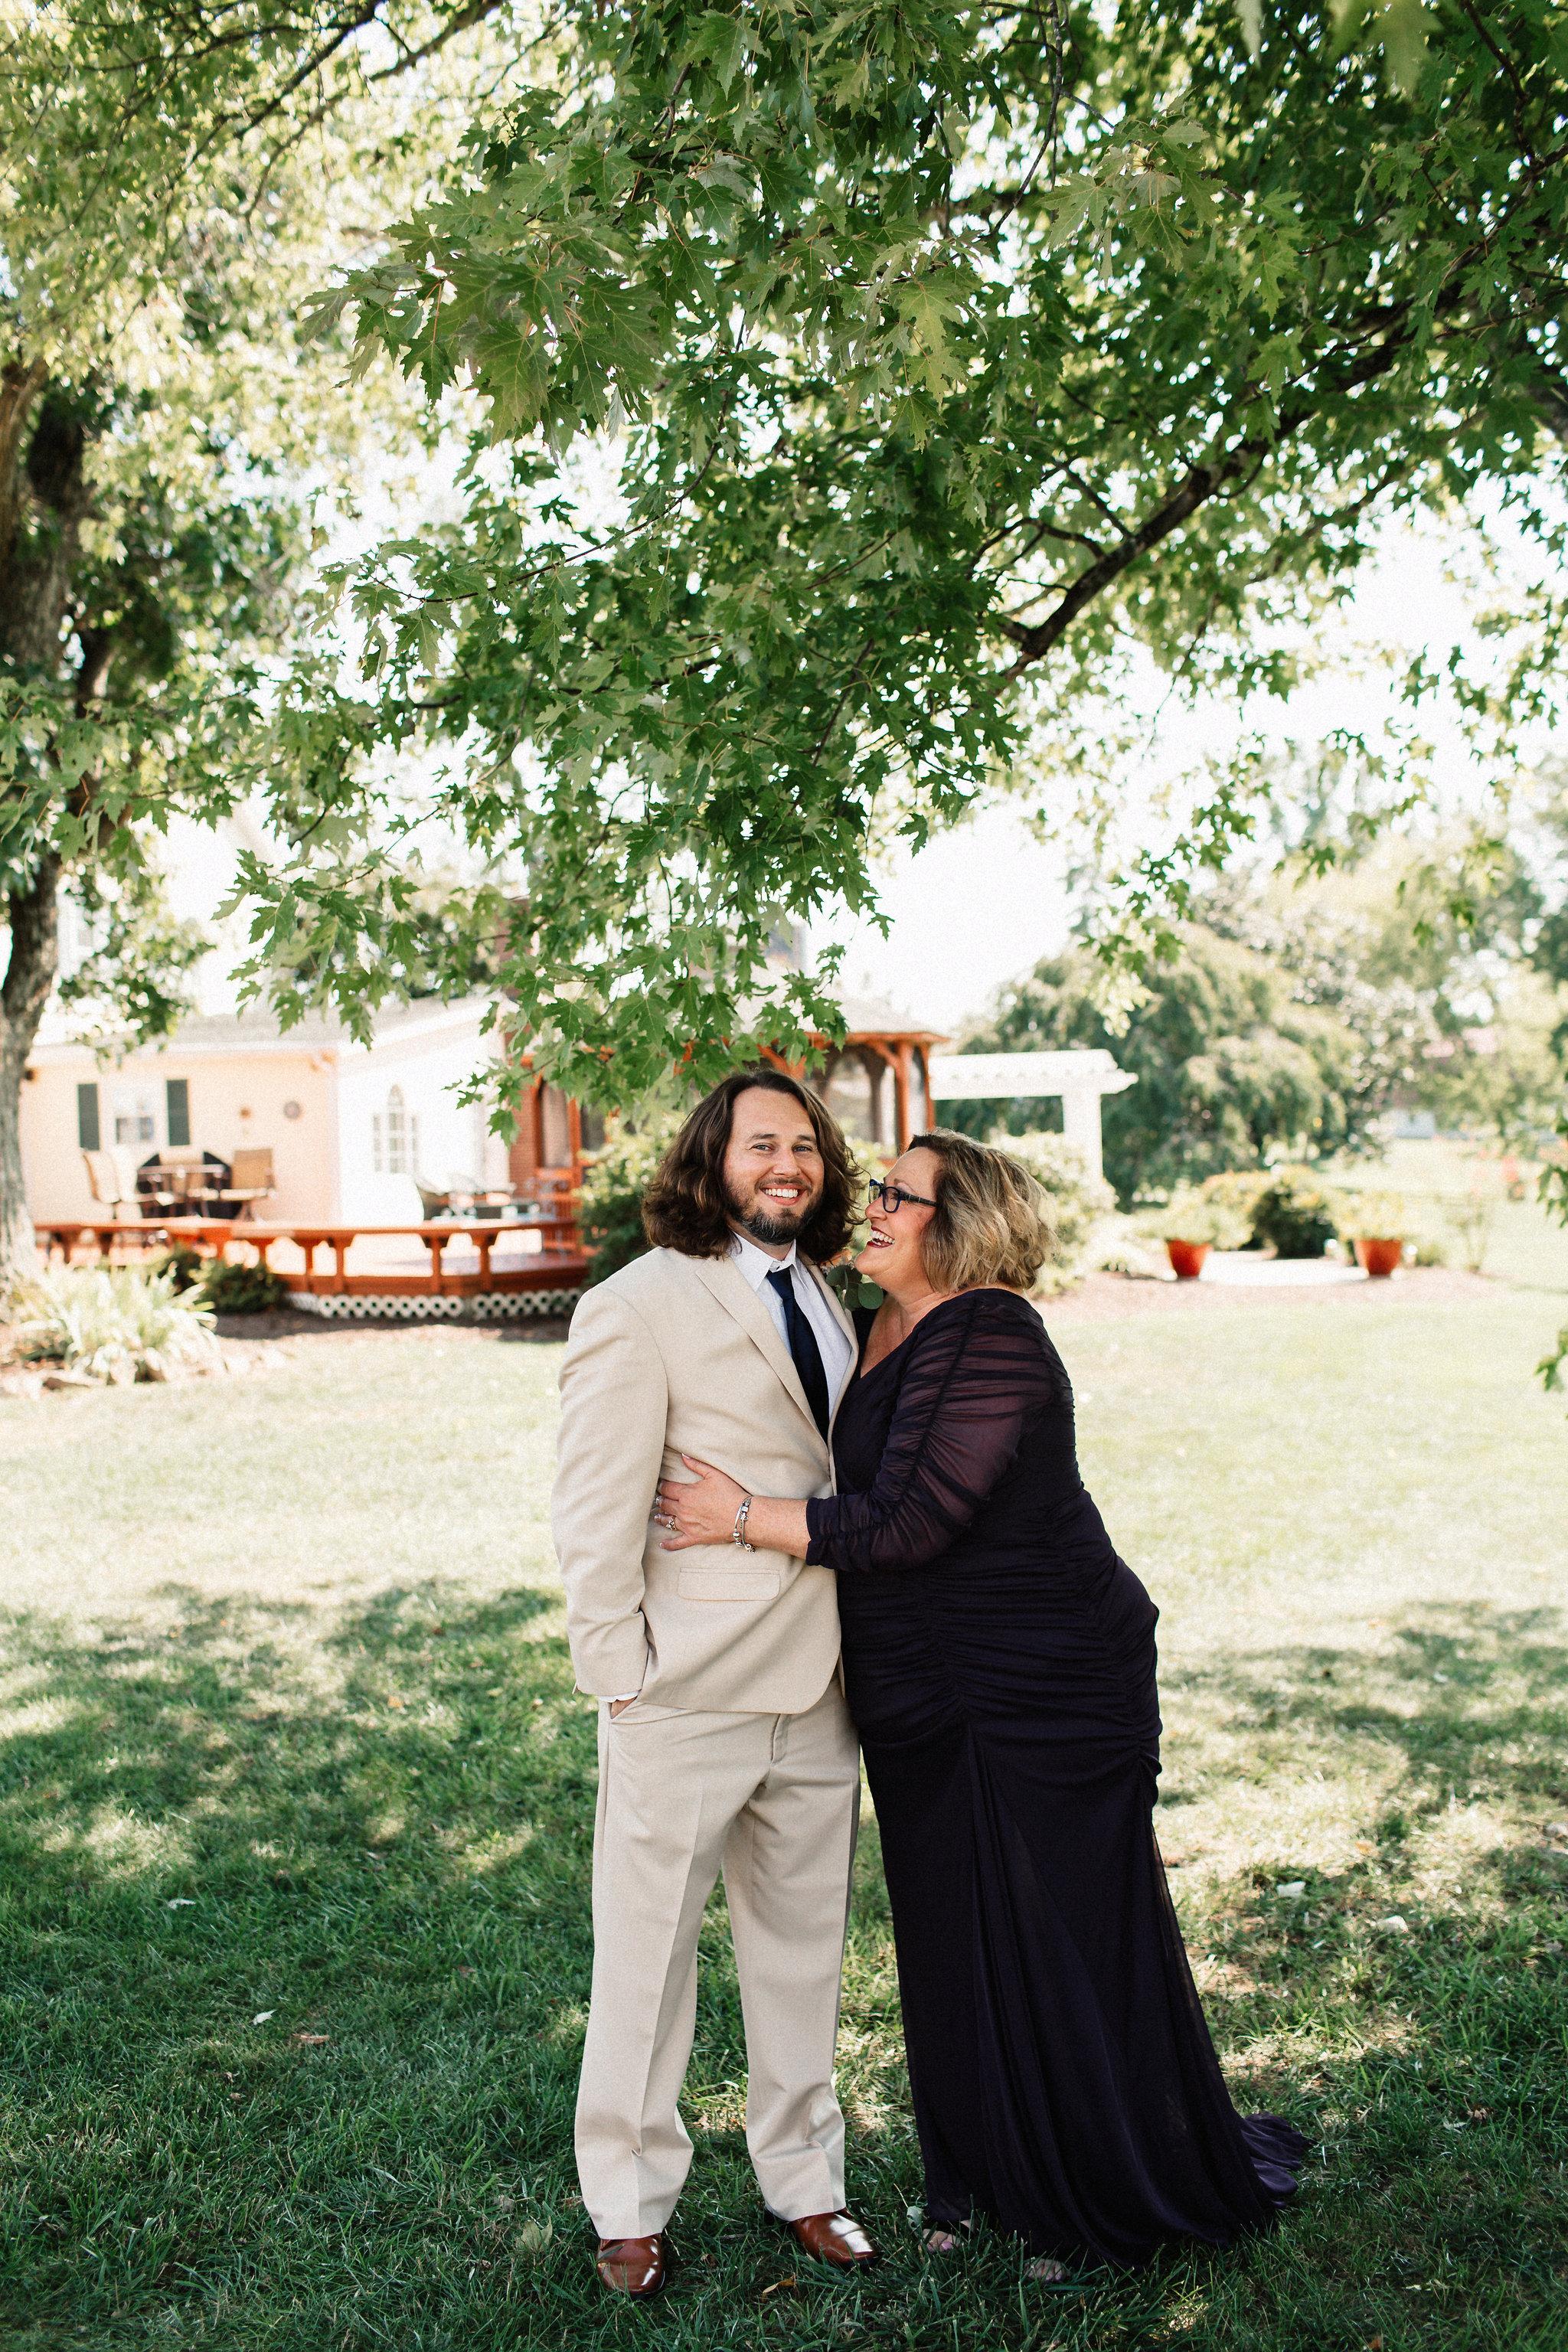 Lindsay&JoshMarried2017-08-31at19.08.08PM201.jpg